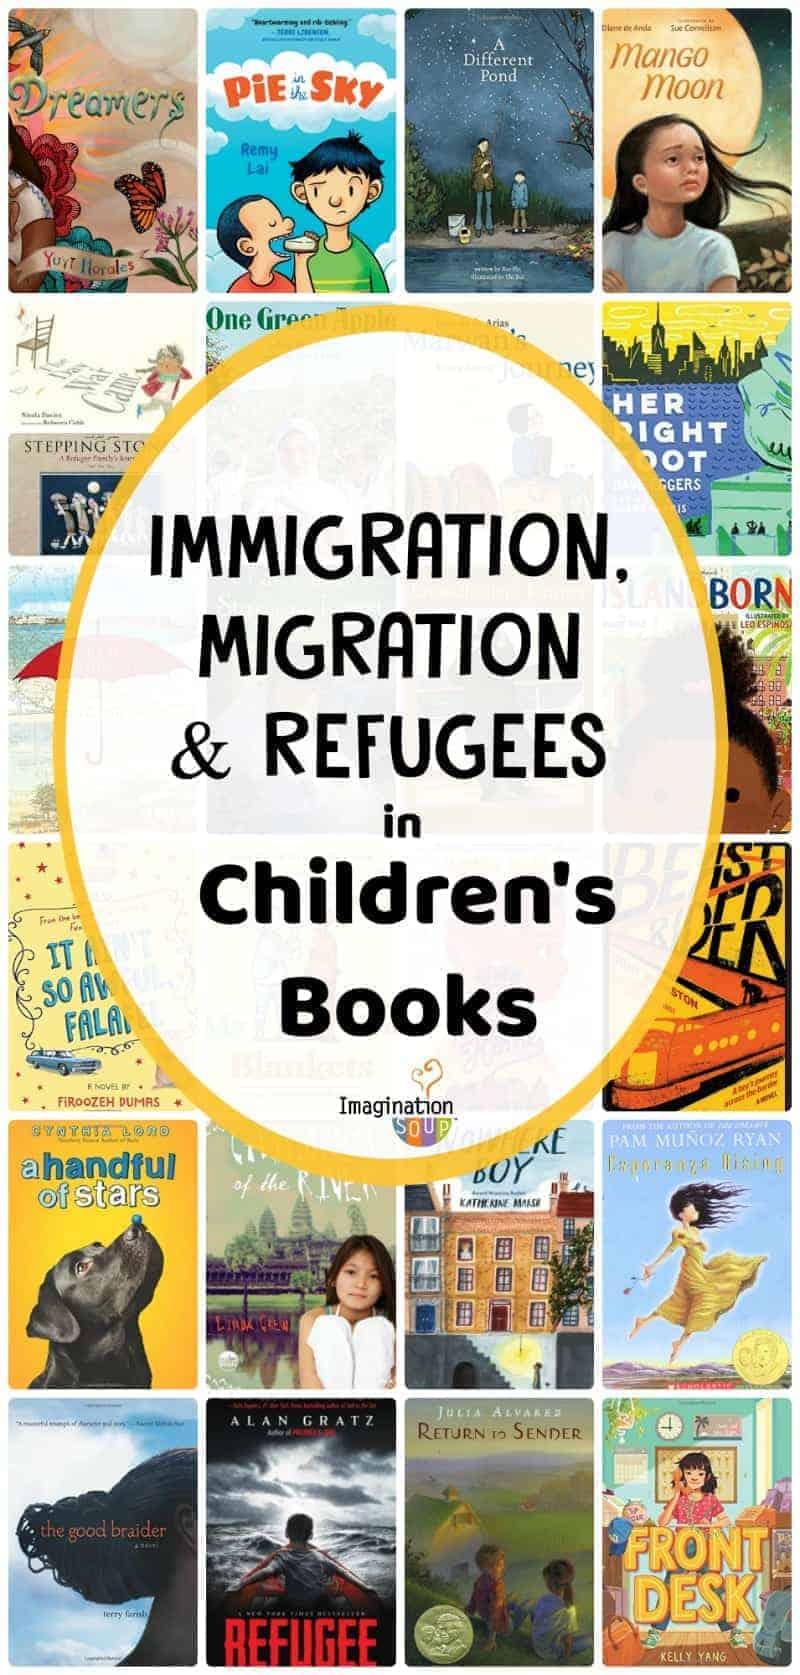 immigration, migration, refugees in children's books